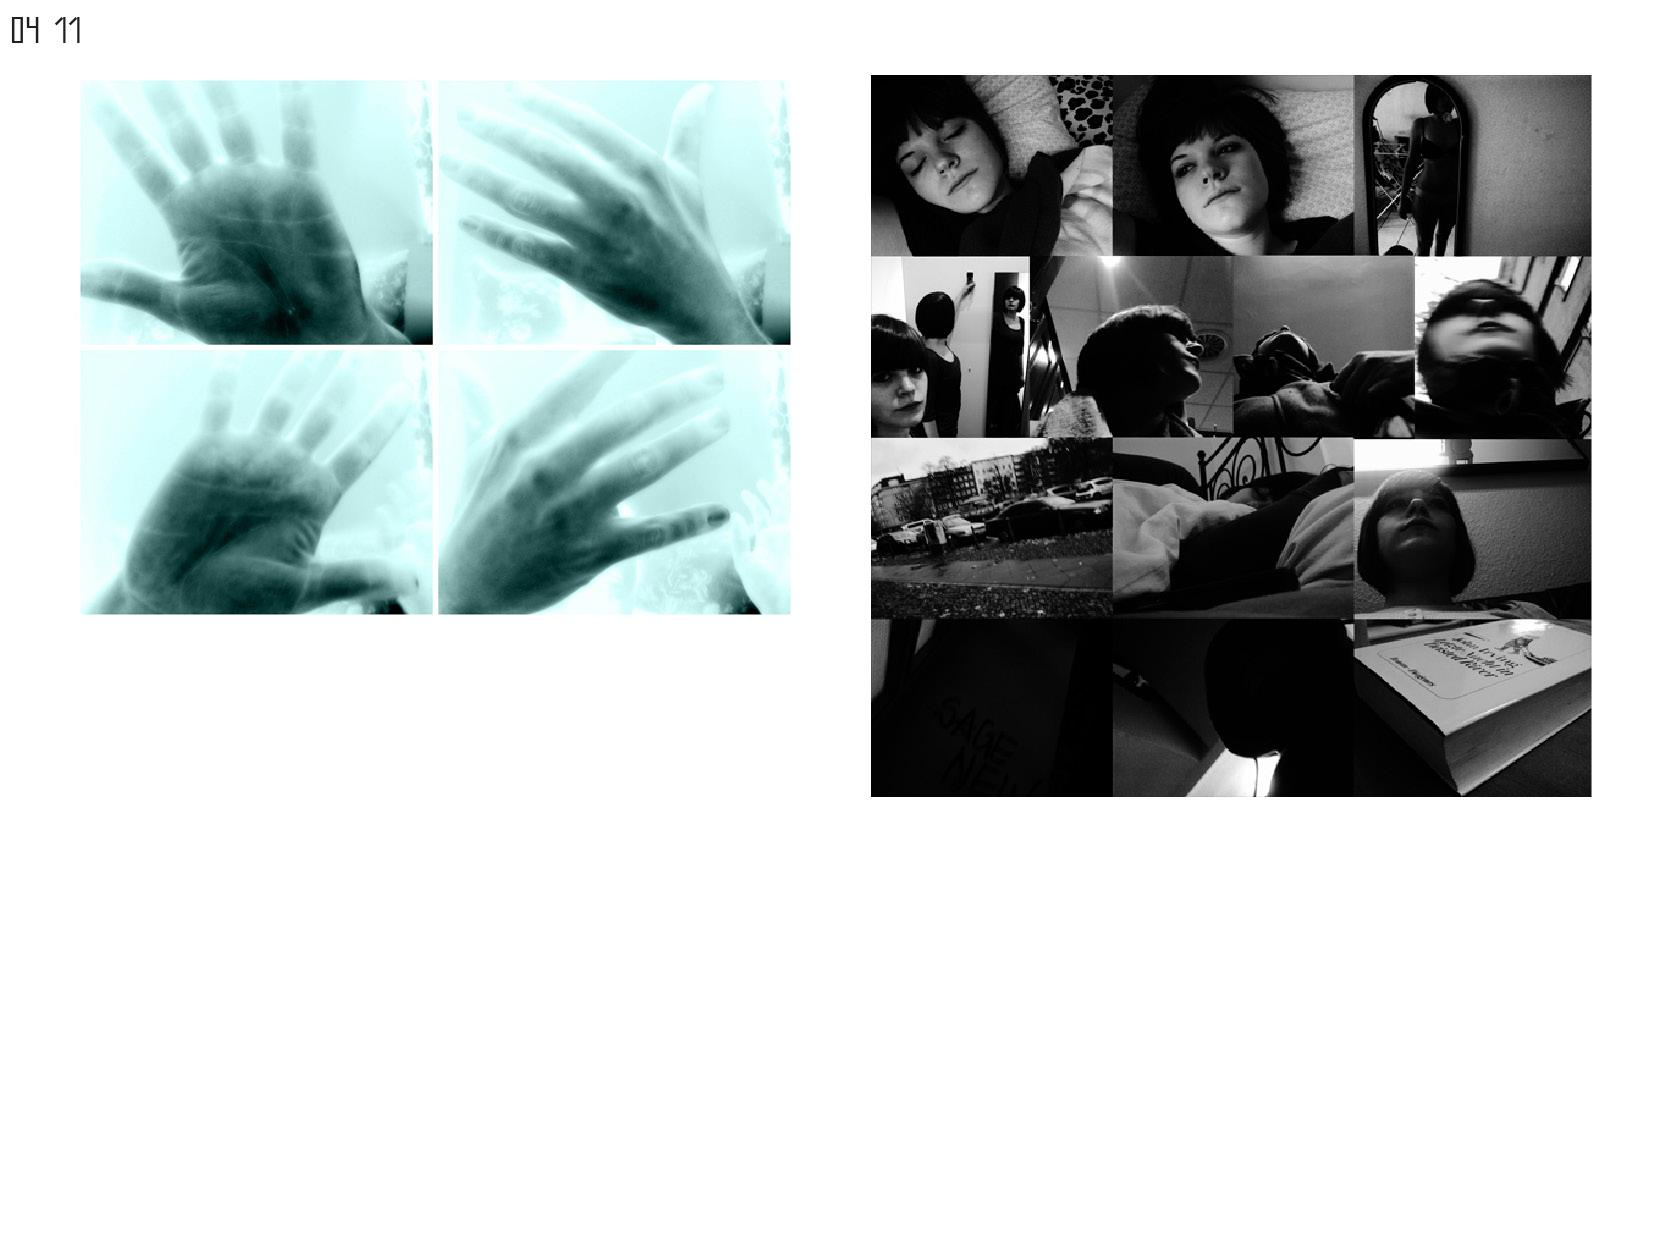 Gerrit-Schweiger-Dialog-Städte-Paris-Berlin-Jessica-Blank-Experiment-Fotoserie-Tagebuch-visuelle-Kommunikation-19